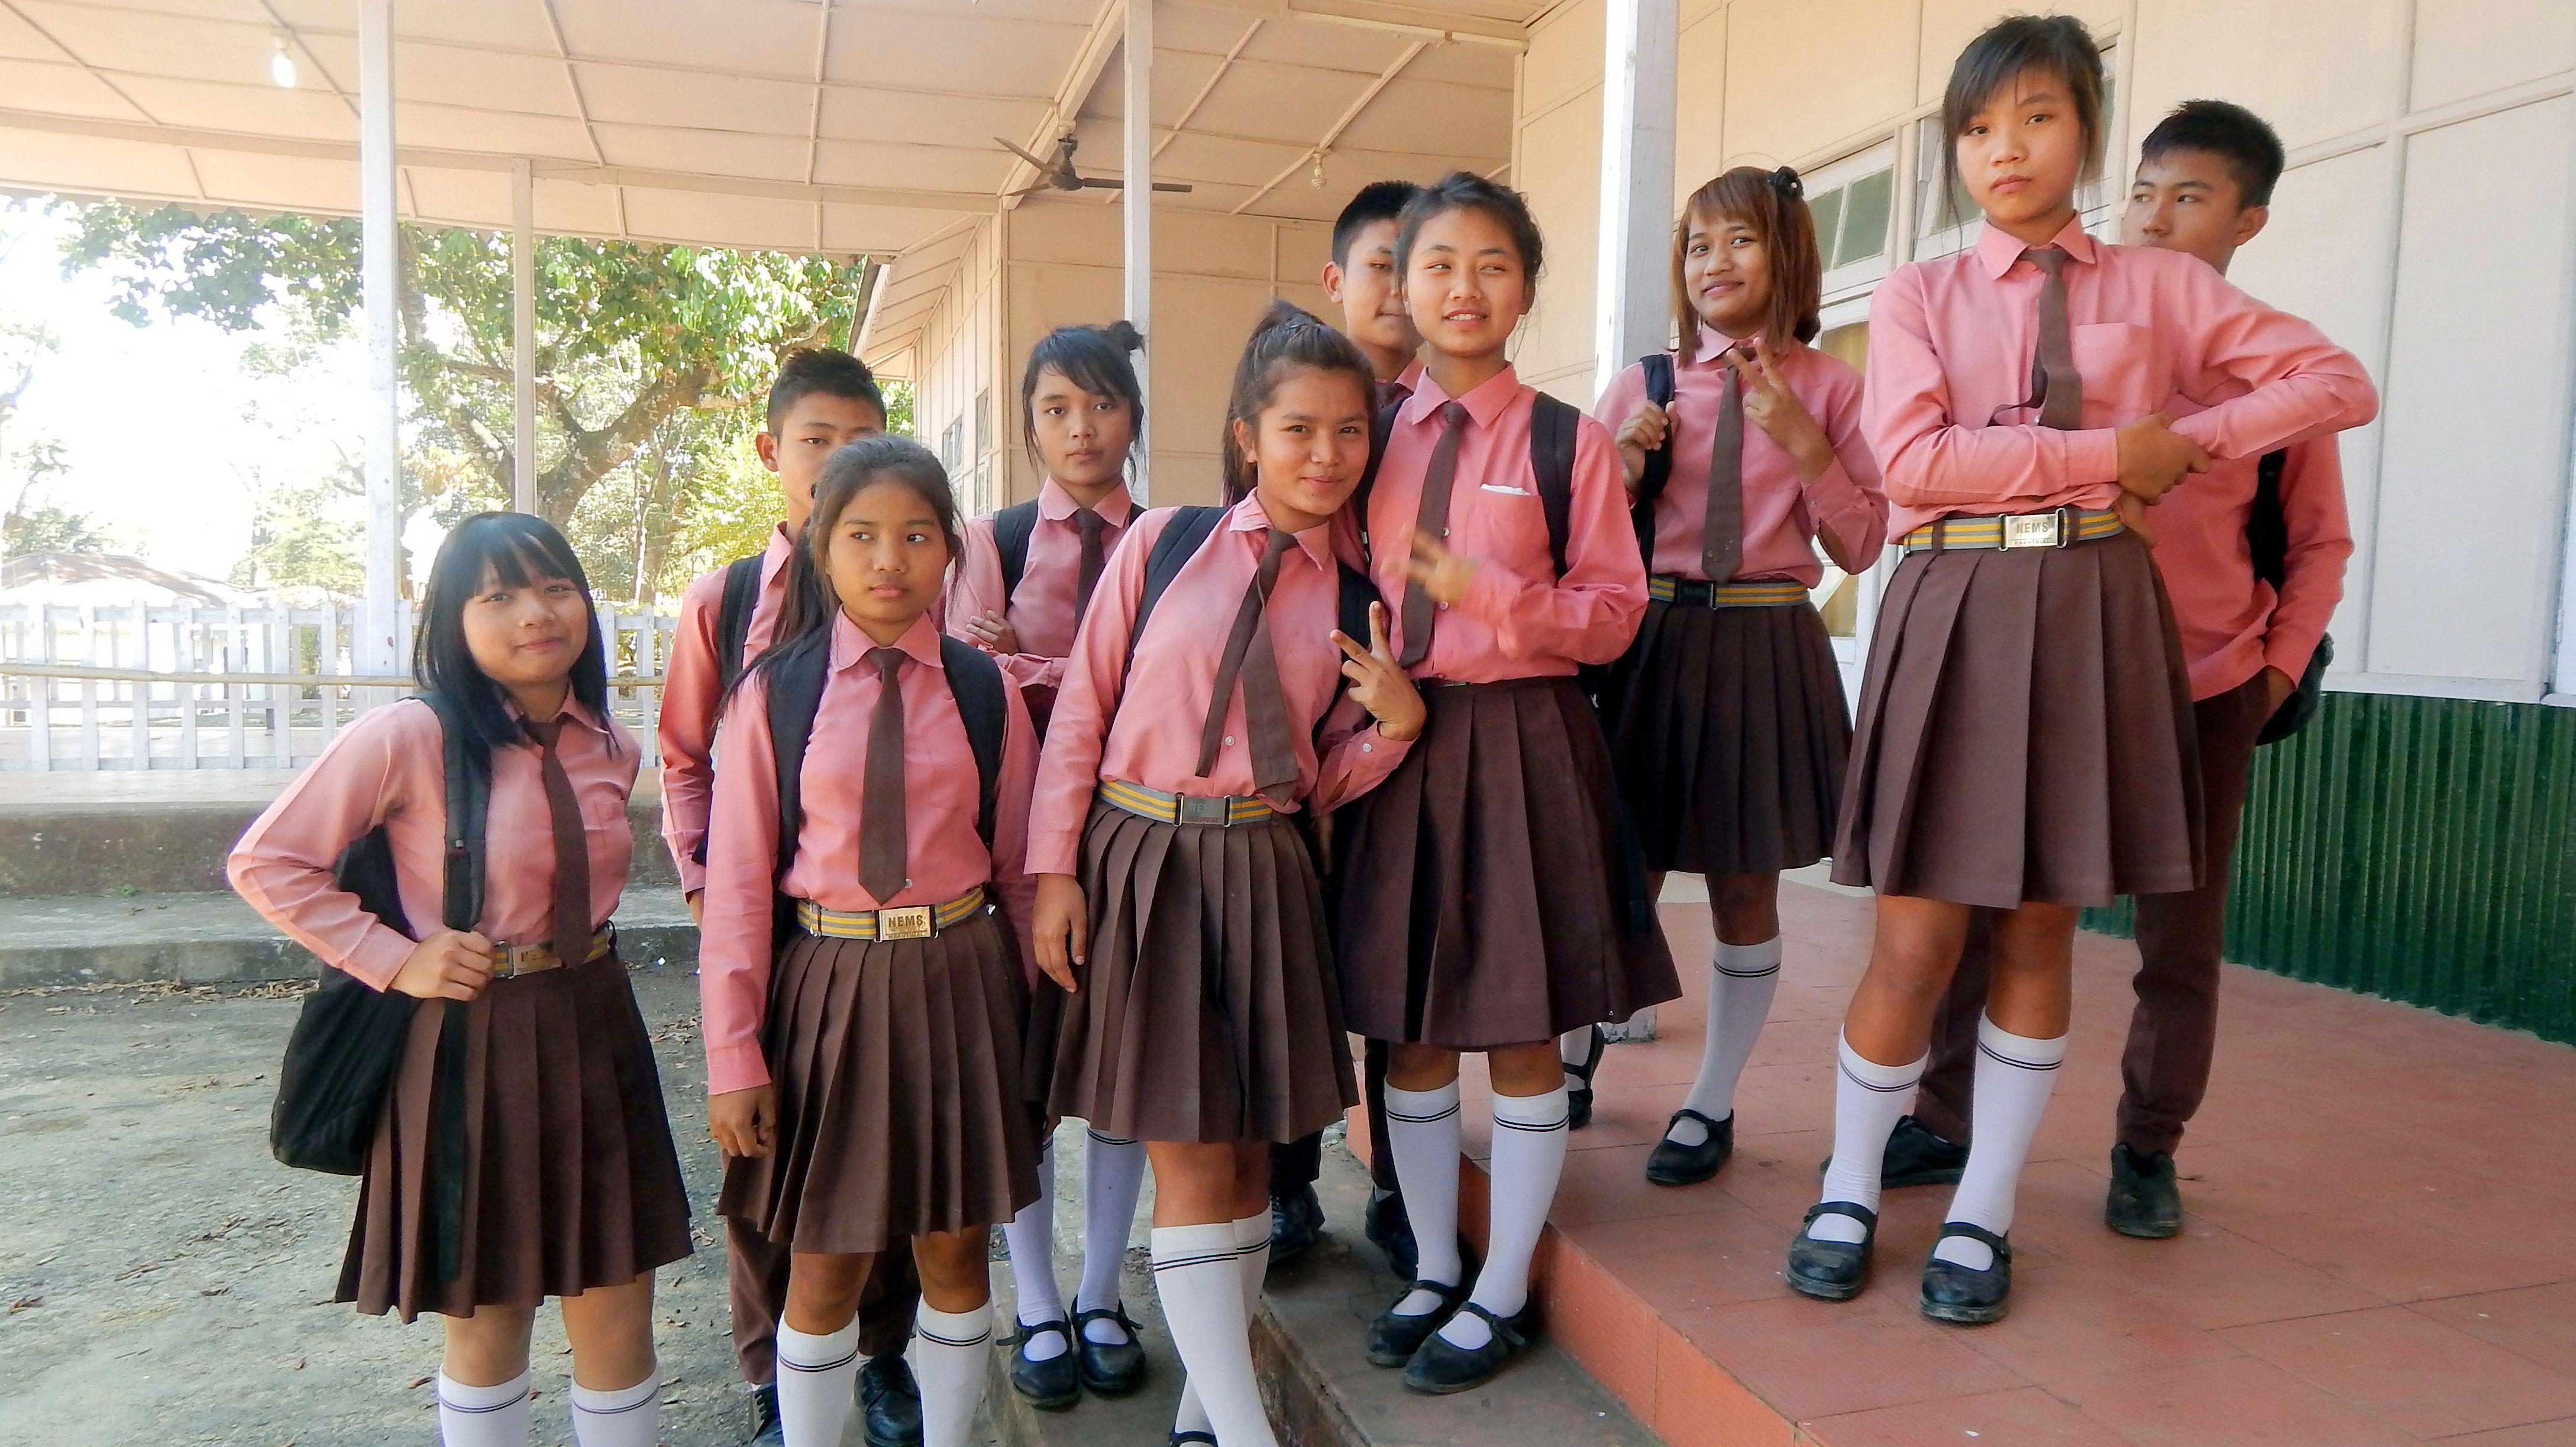 India School | School admissions, Private school, Boys school uniform